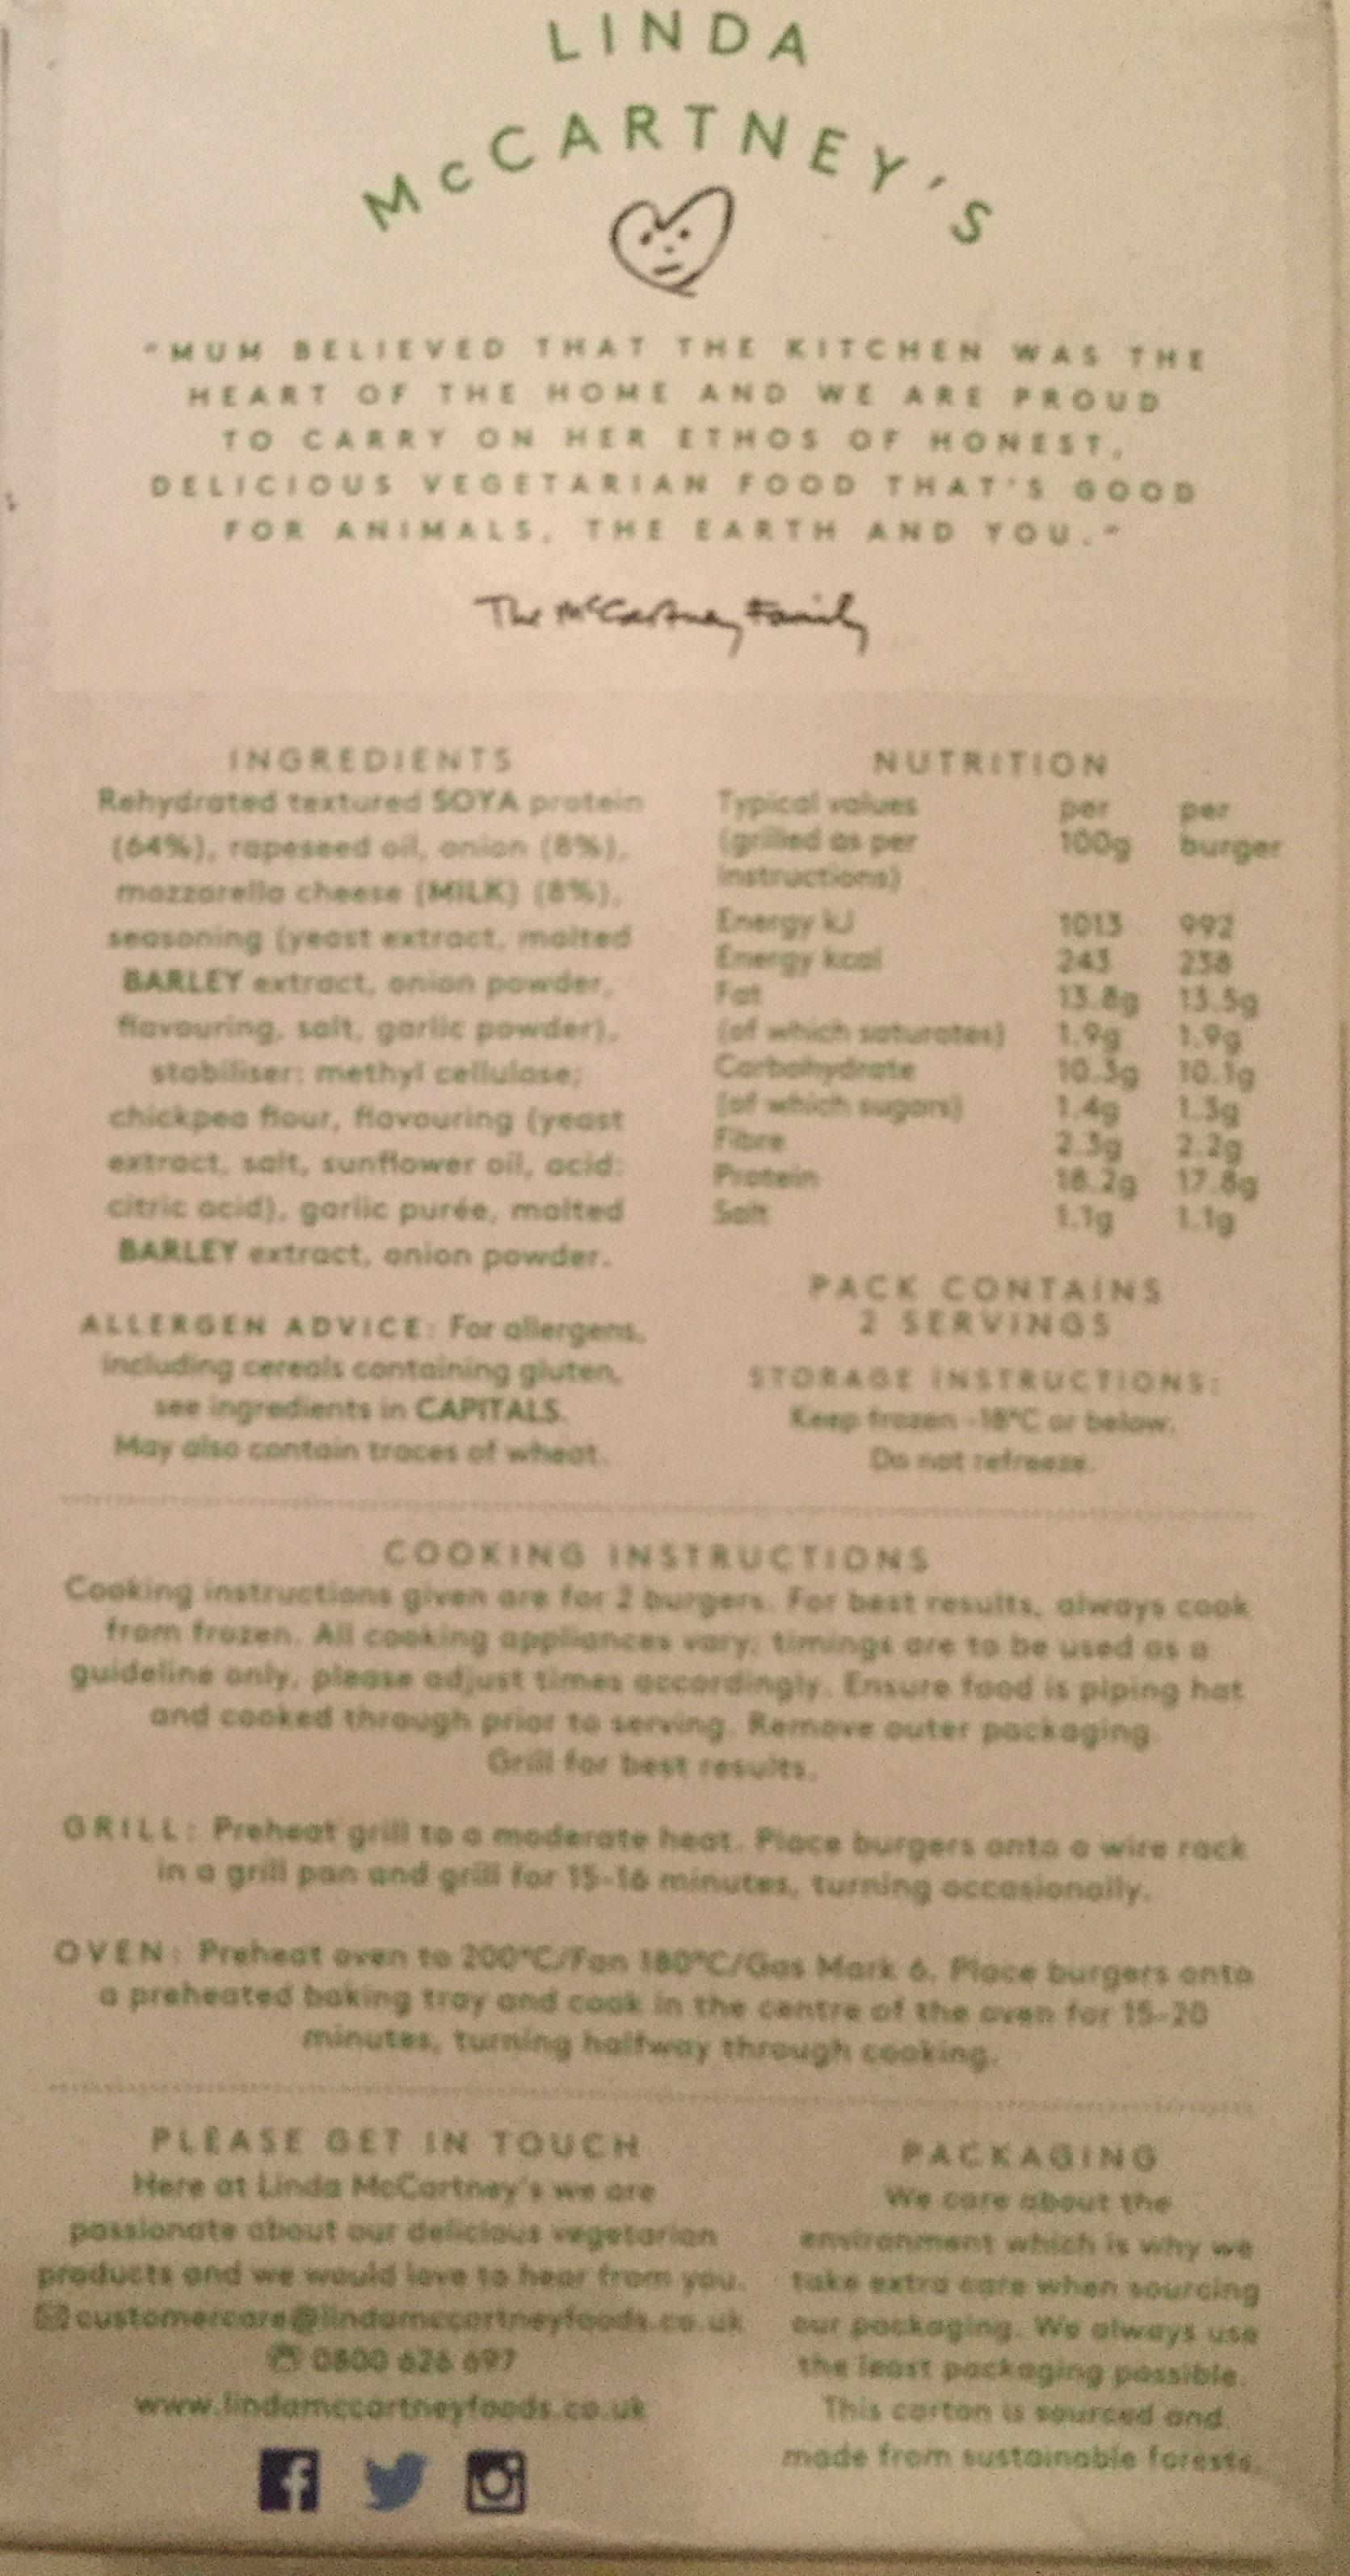 Linda Mccartney's 2 Vegetarian mozzarella 1/4 lb burgers - Ingredients - en